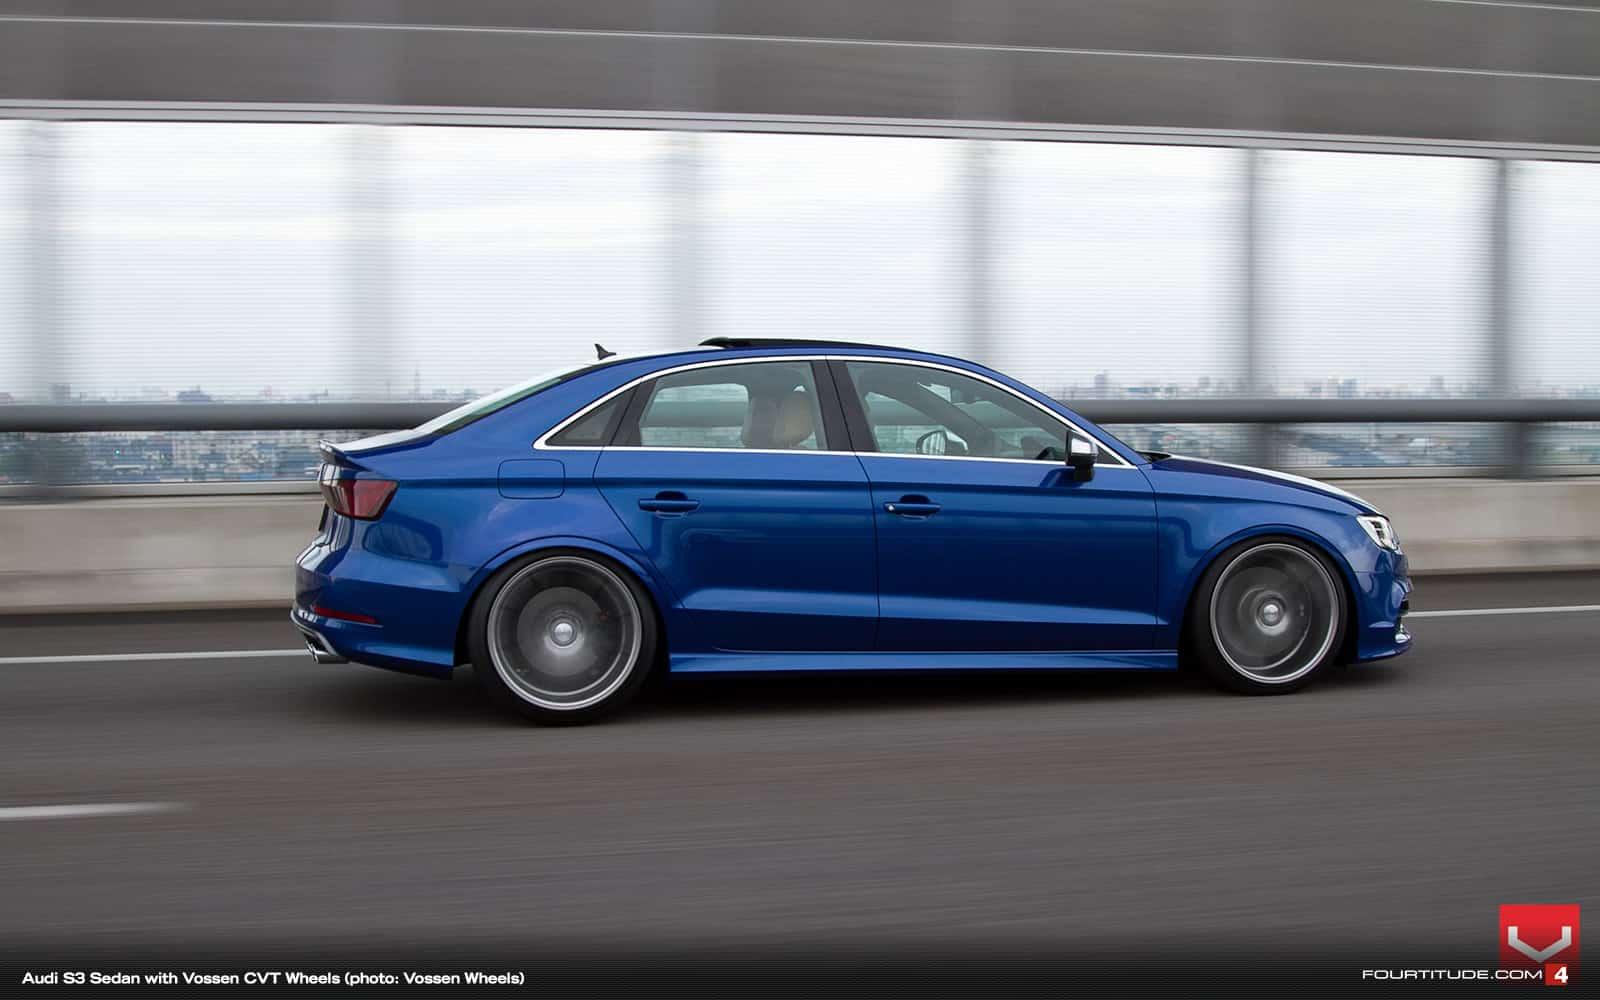 Audi-S3-sedan-Vossen-CVT-Naples-Speed-330